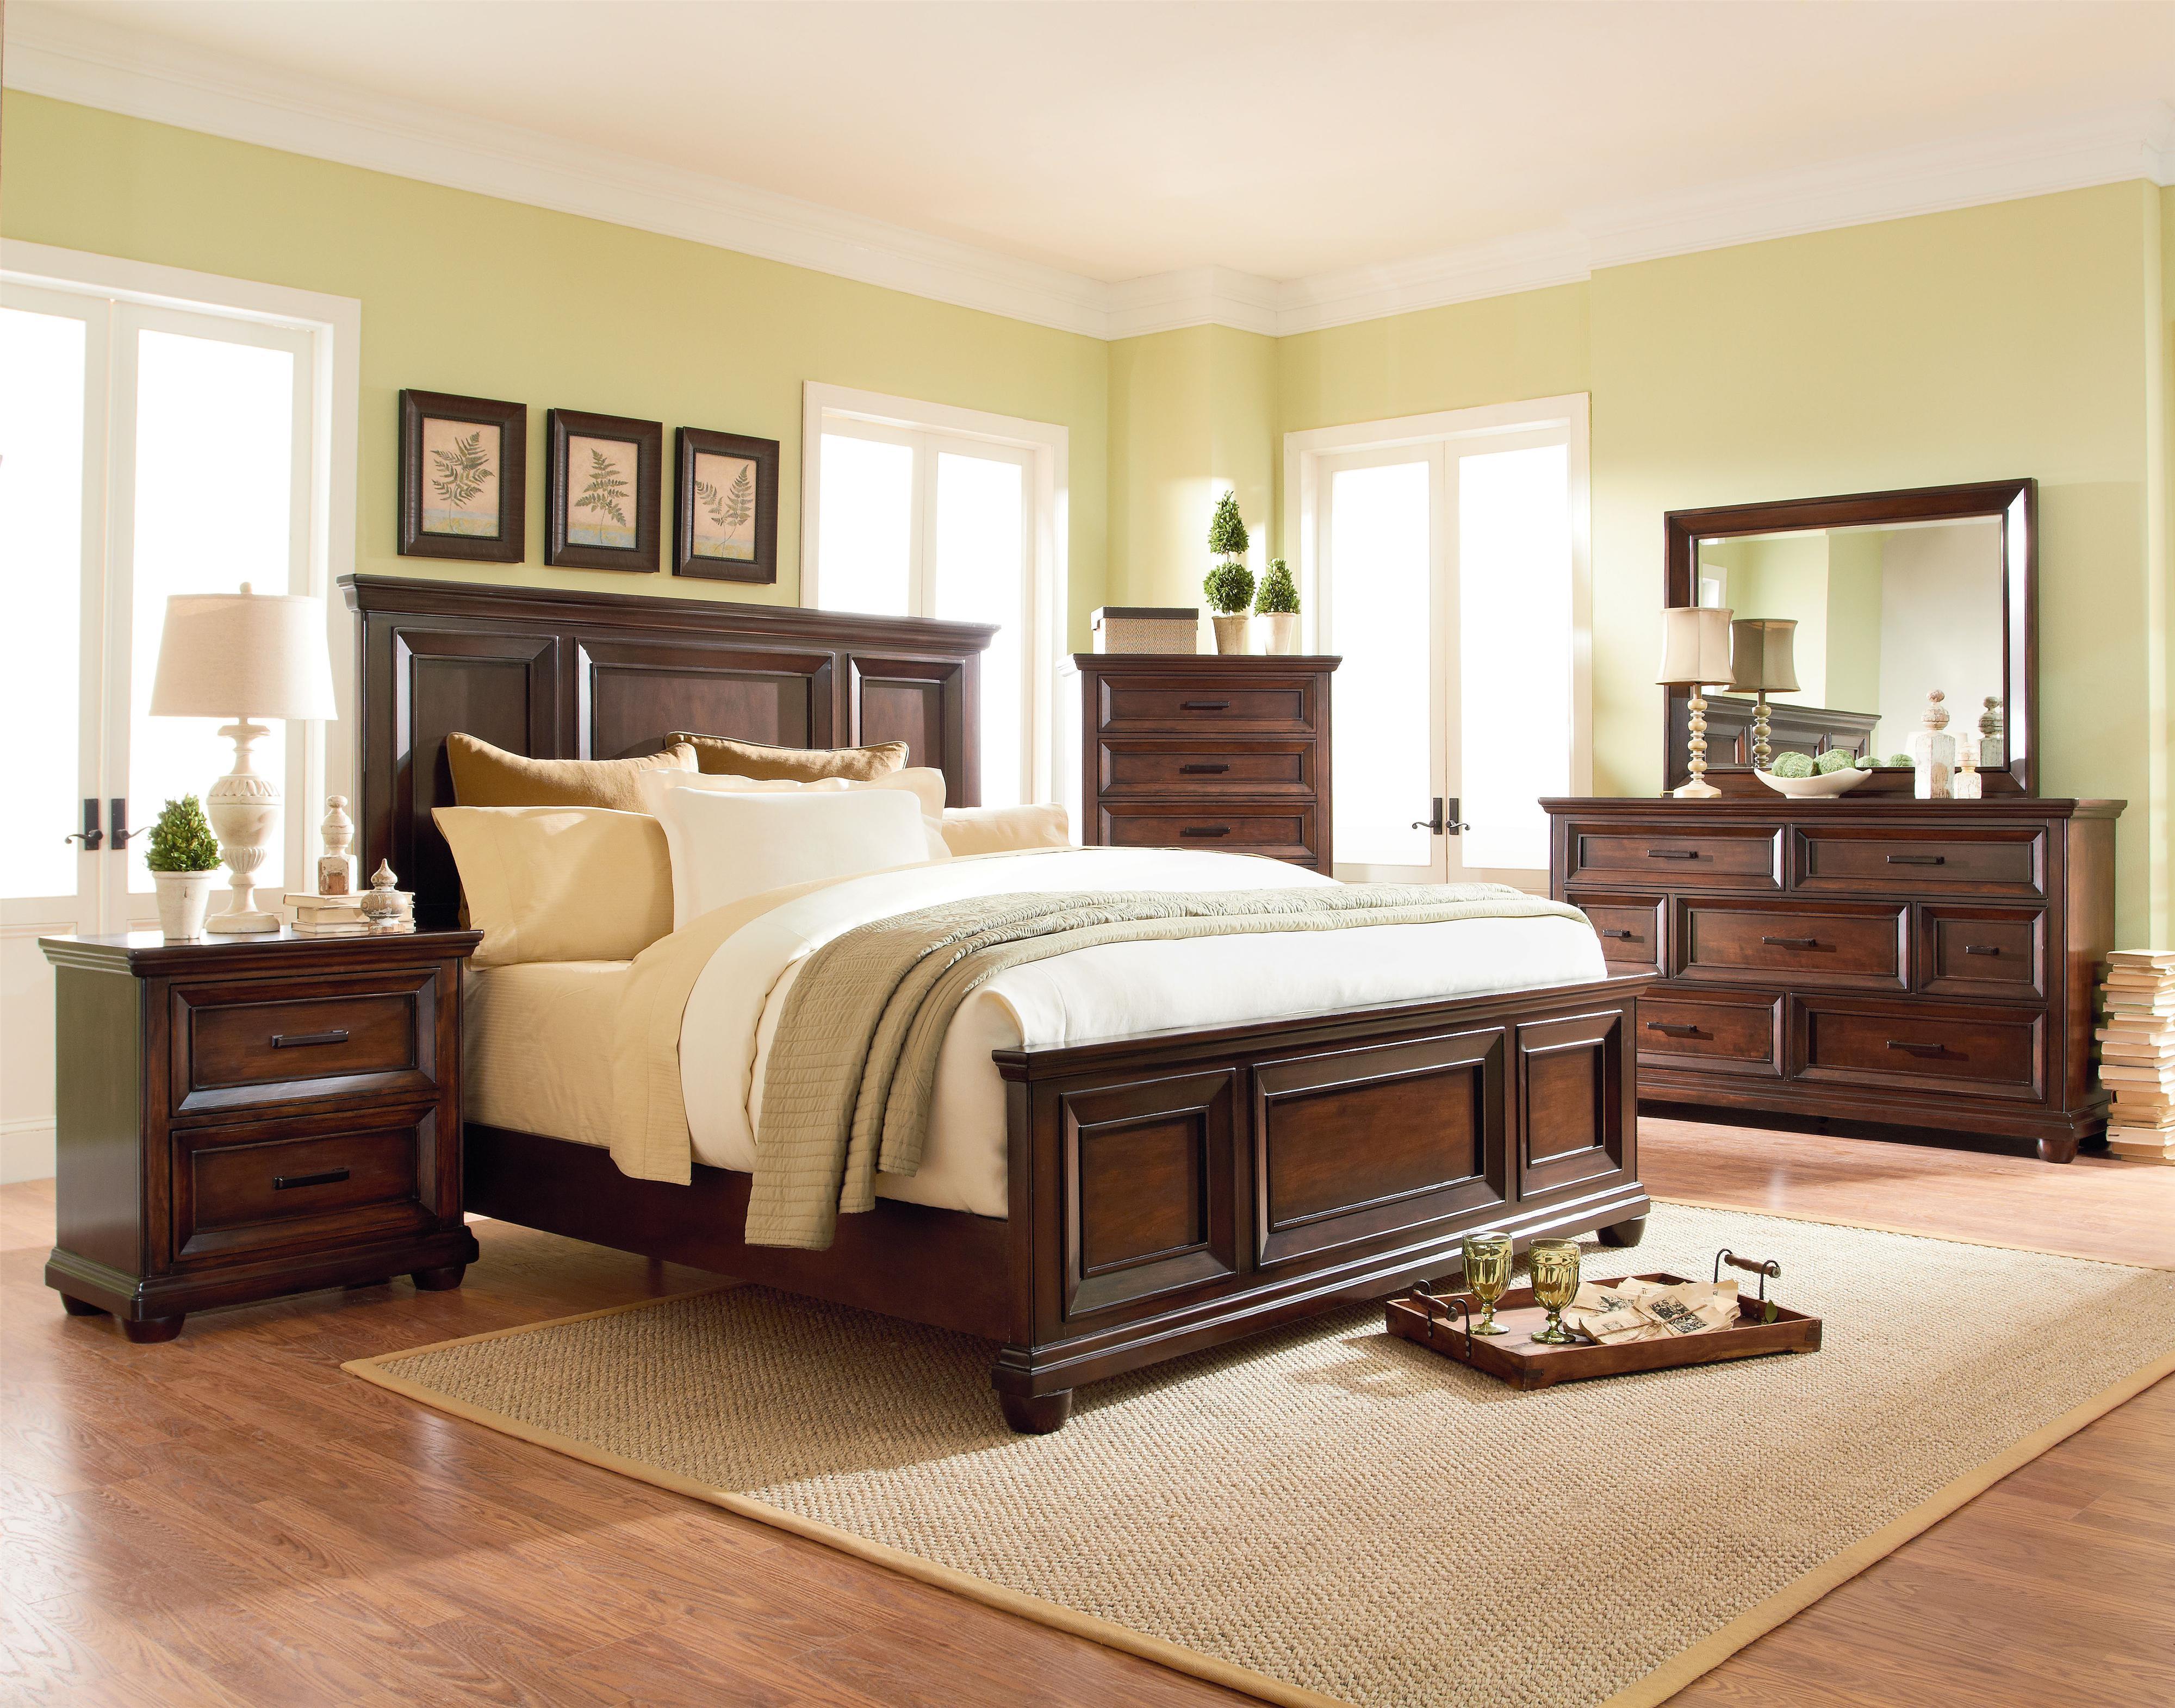 Standard Furniture Vineyard King Bedroom Group - Item Number: 877 King Bedroom 1